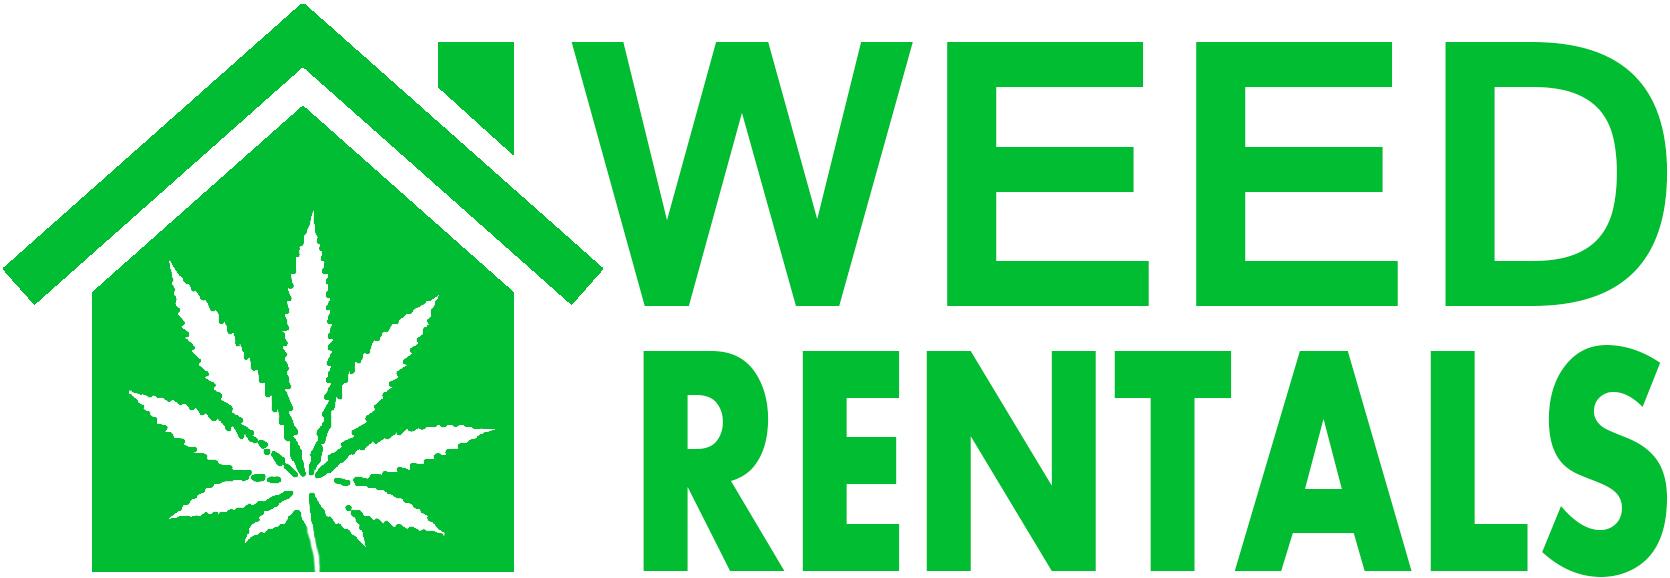 Weed Rentals | Marijuana Friendly Accommodations